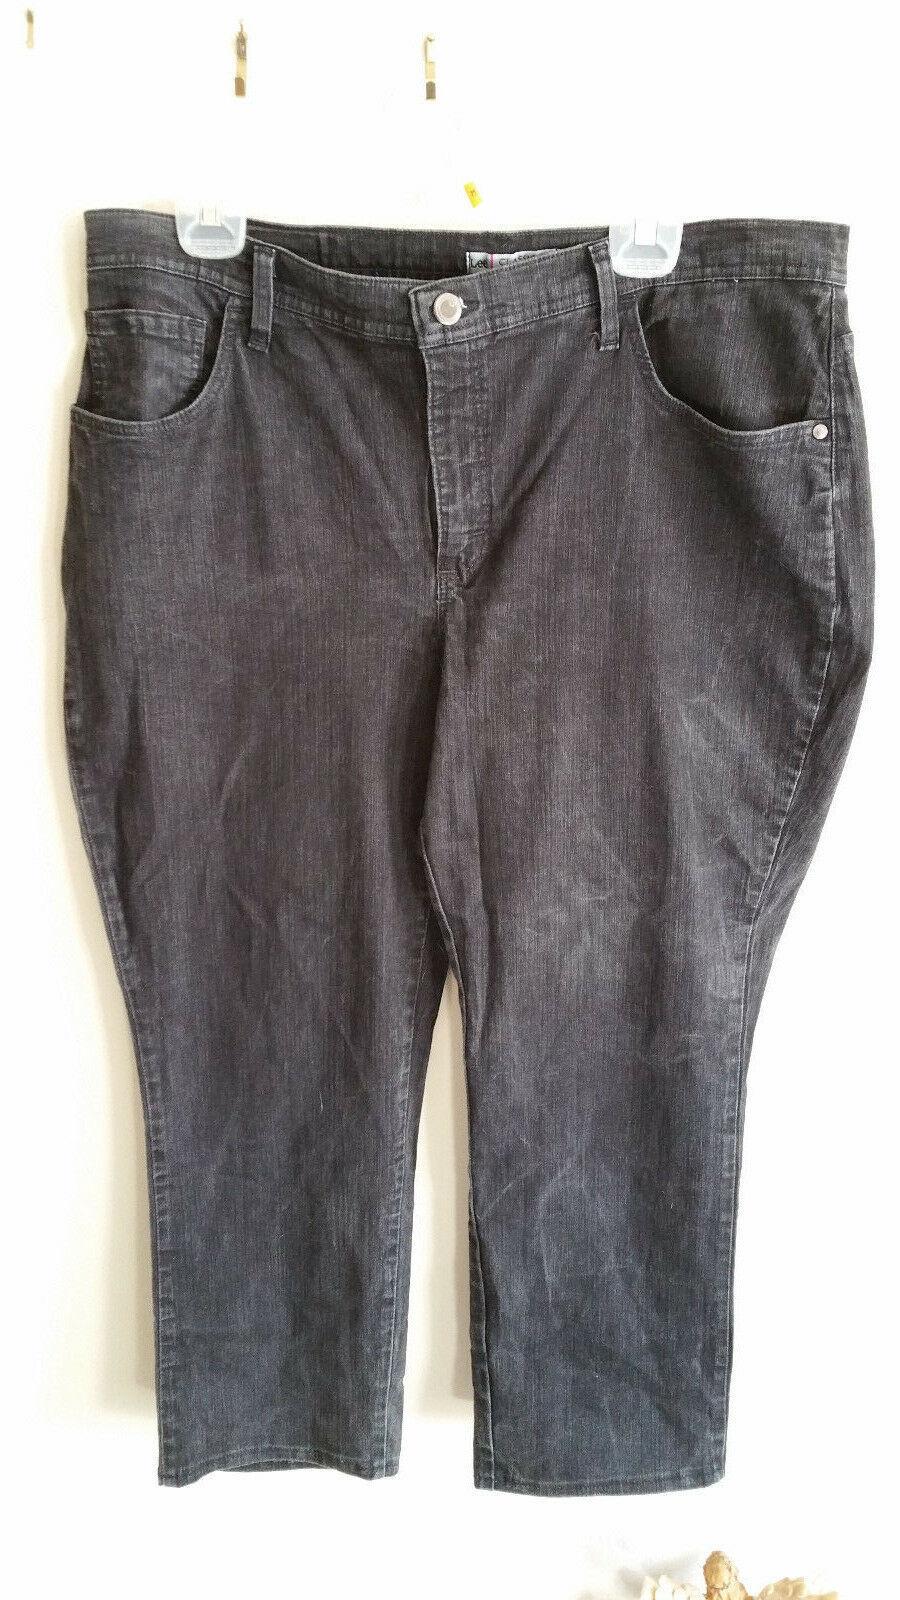 Plus size Petite 18W  Lee Jeans Classic Fit Dark Wash Stright Leg  image 5